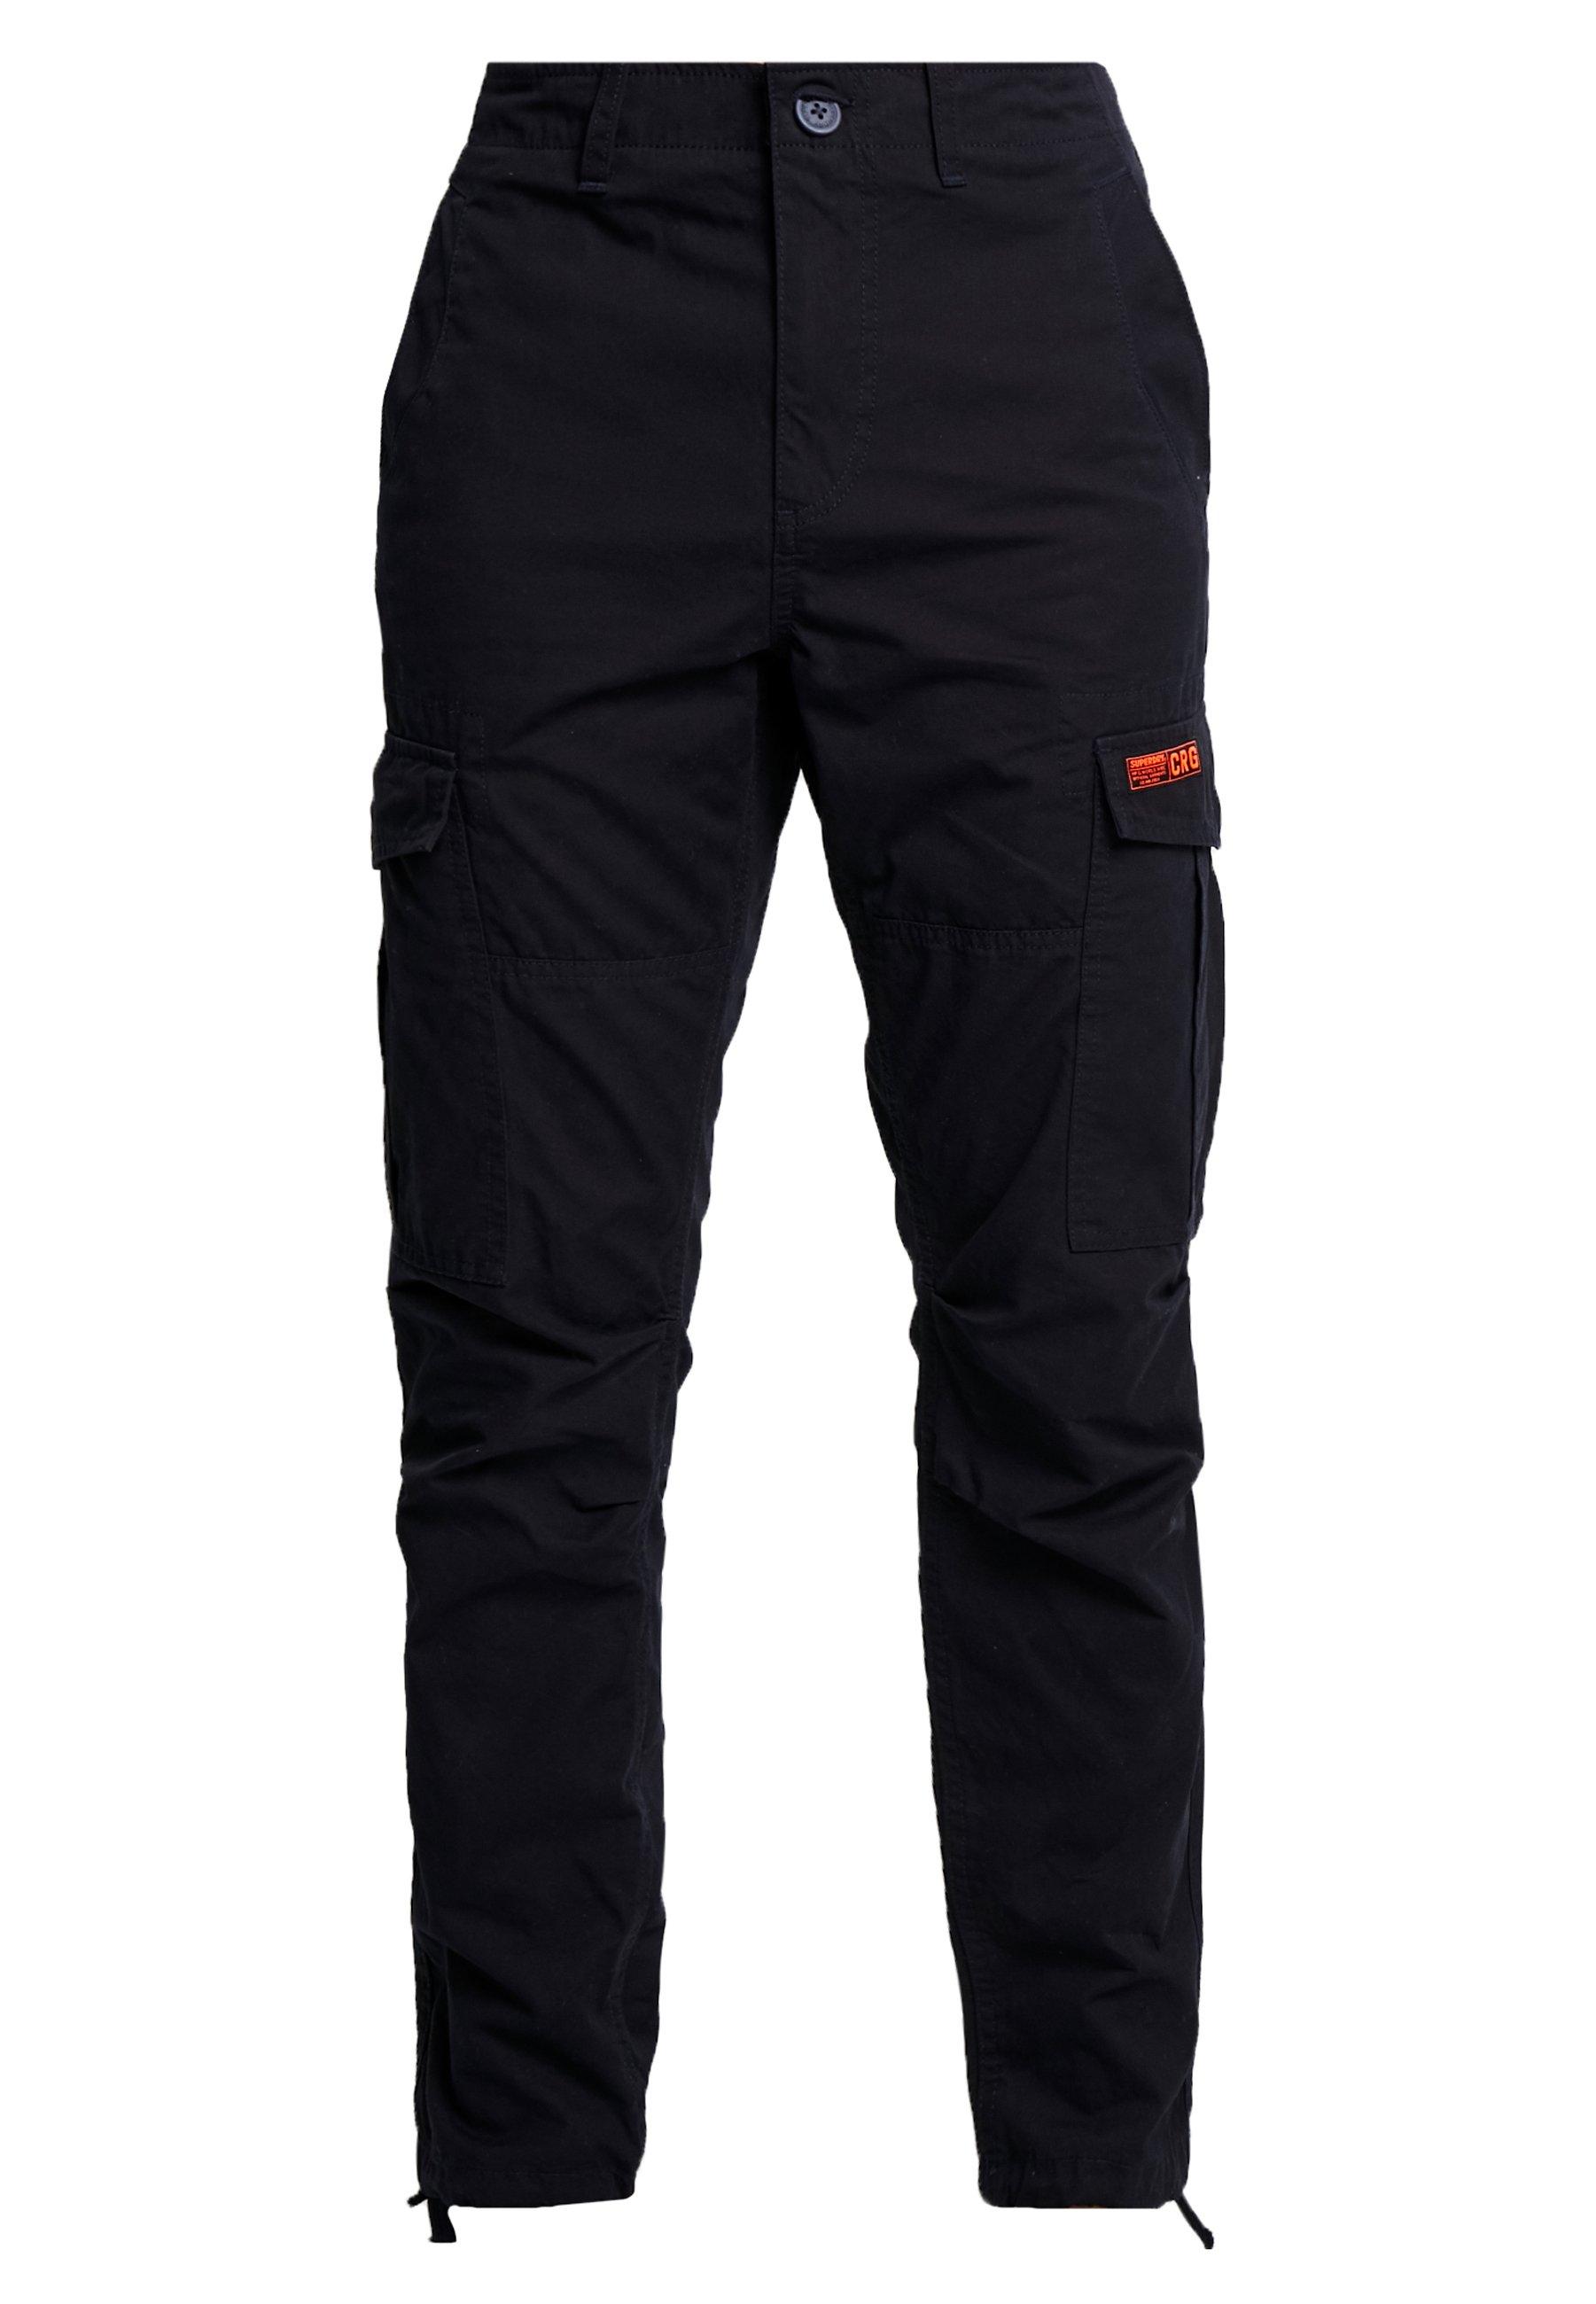 Superdry PARACHUTE PANT - Pantalon cargo - midnight navy